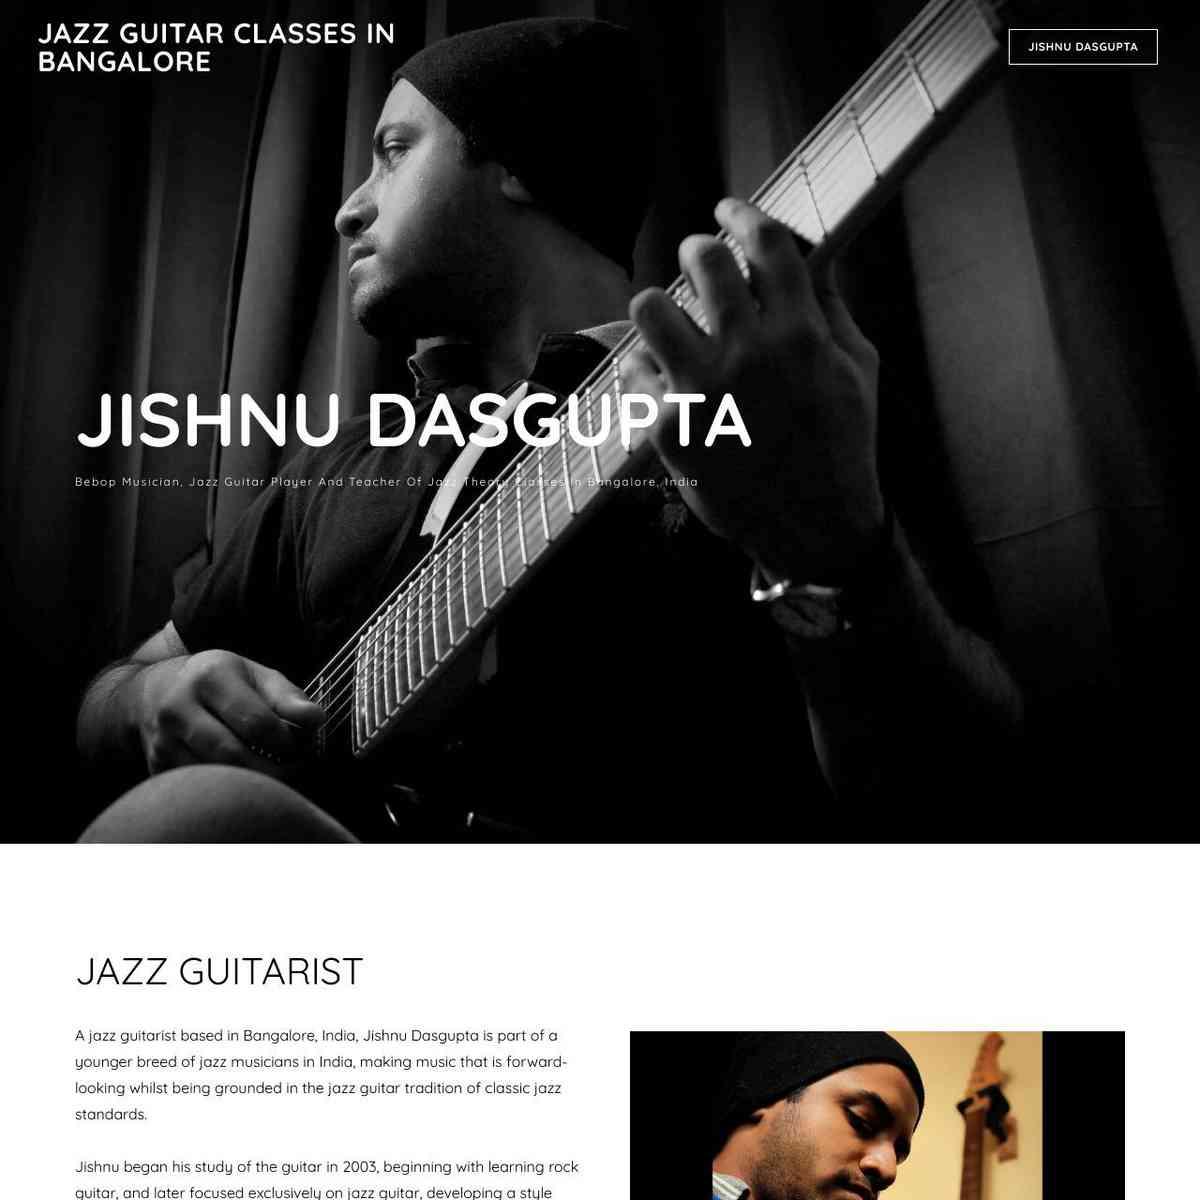 https://jishnu-dasgupta.weebly.com/